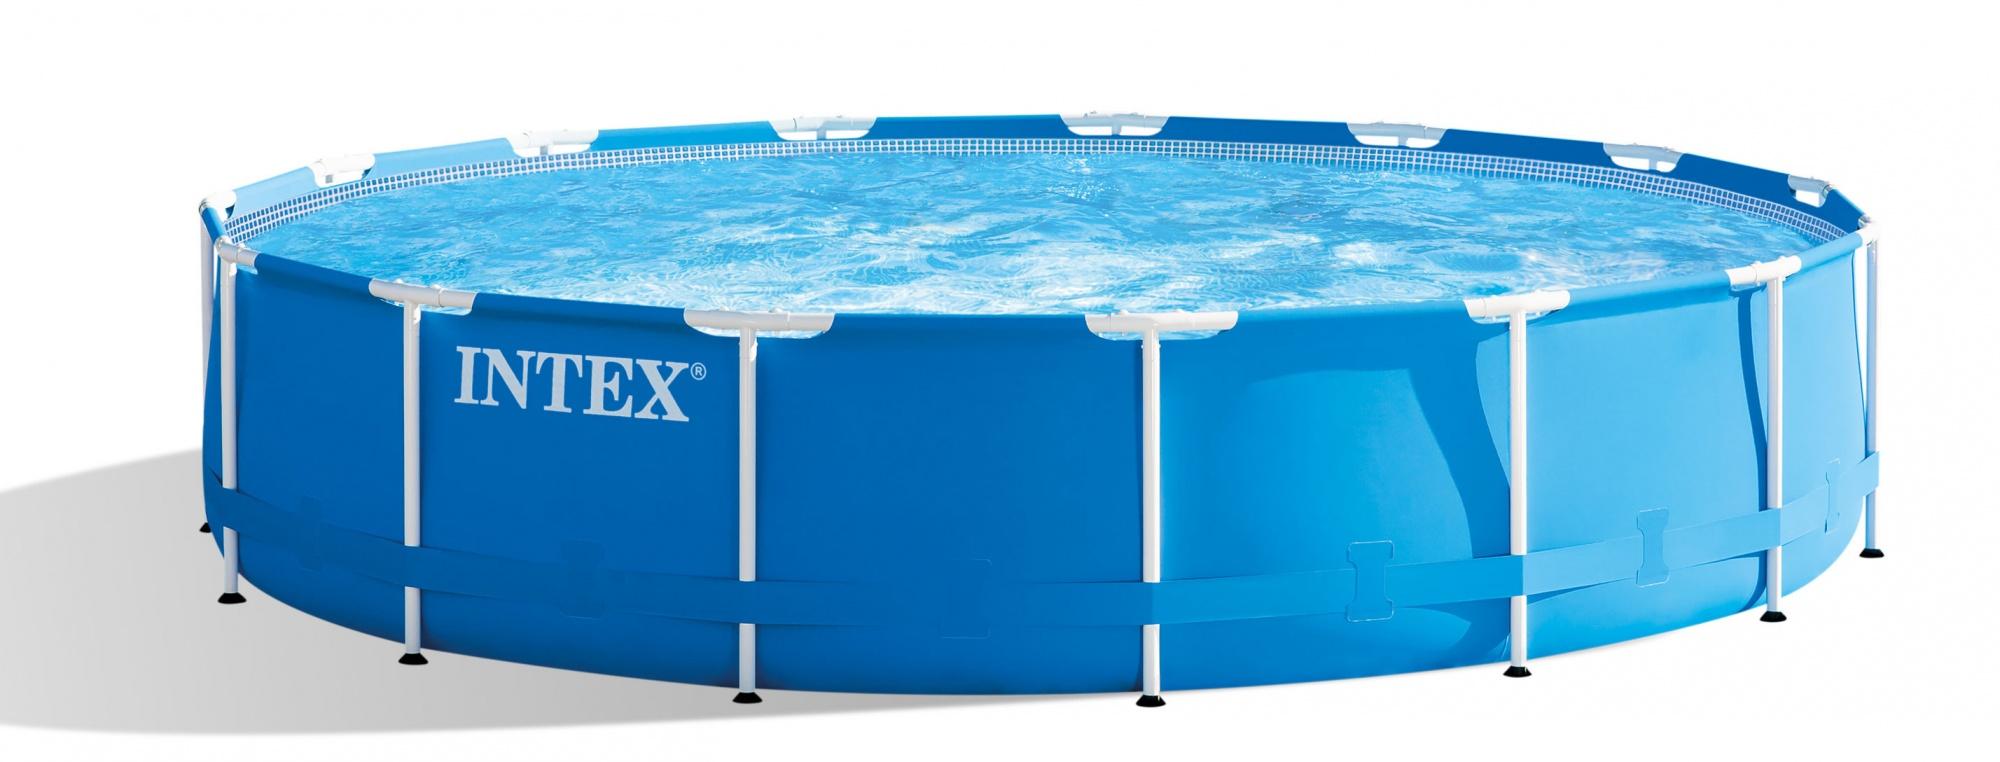 Product Description Intex Design Pool Metal Frame